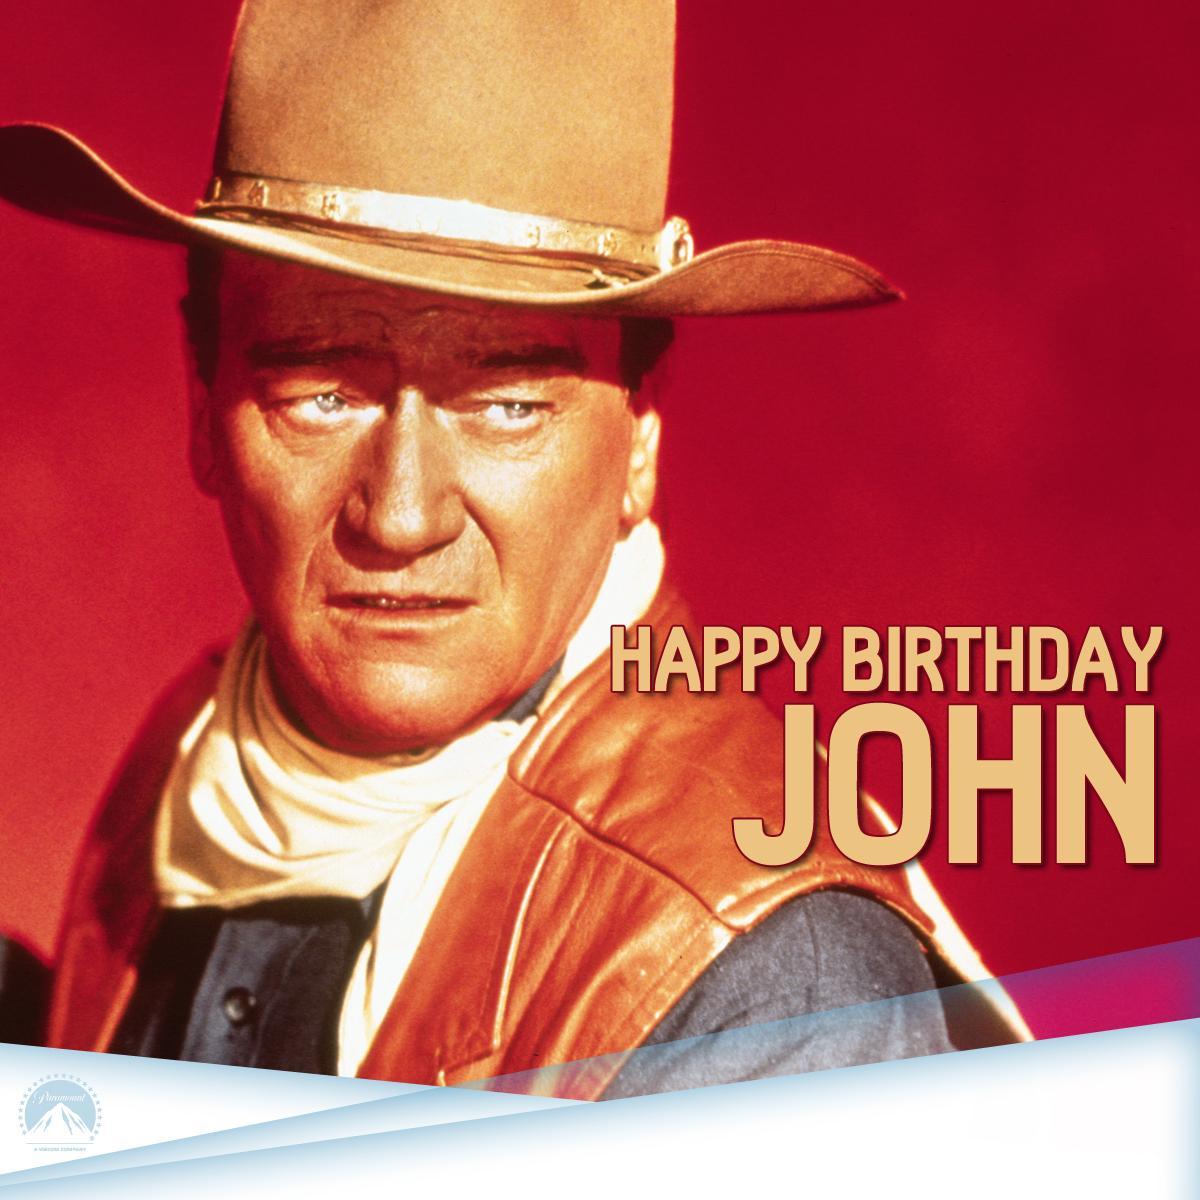 john wayne birthday Happy birthday john wayne!   scoopnest.com john wayne birthday